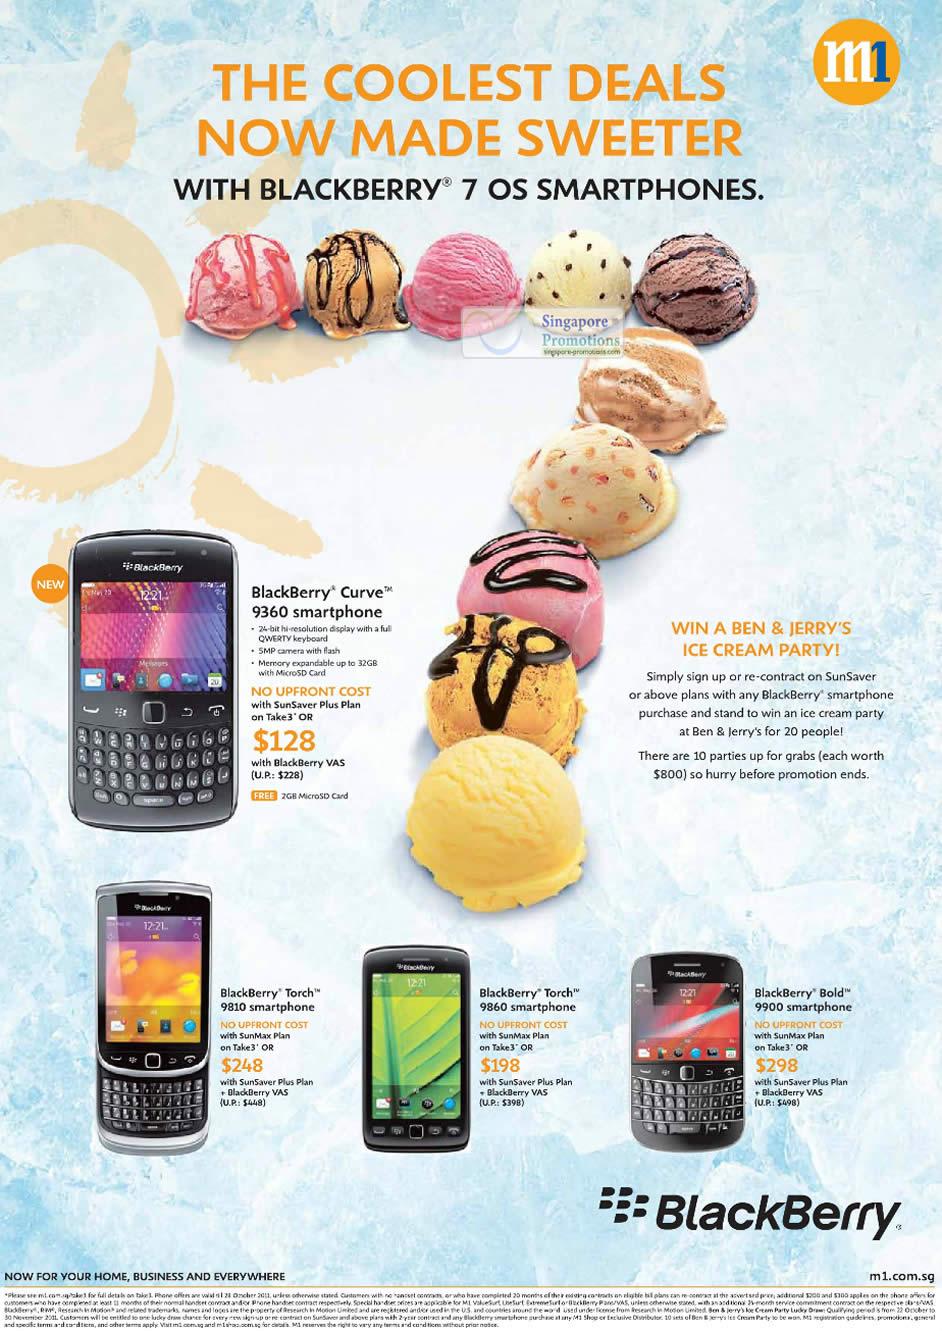 Blackberry 7 OS, Blackberry Curve 9360, BlackBerry Torch 9810, BlackBerry Torch 9860, BlackBerry Bold 9900